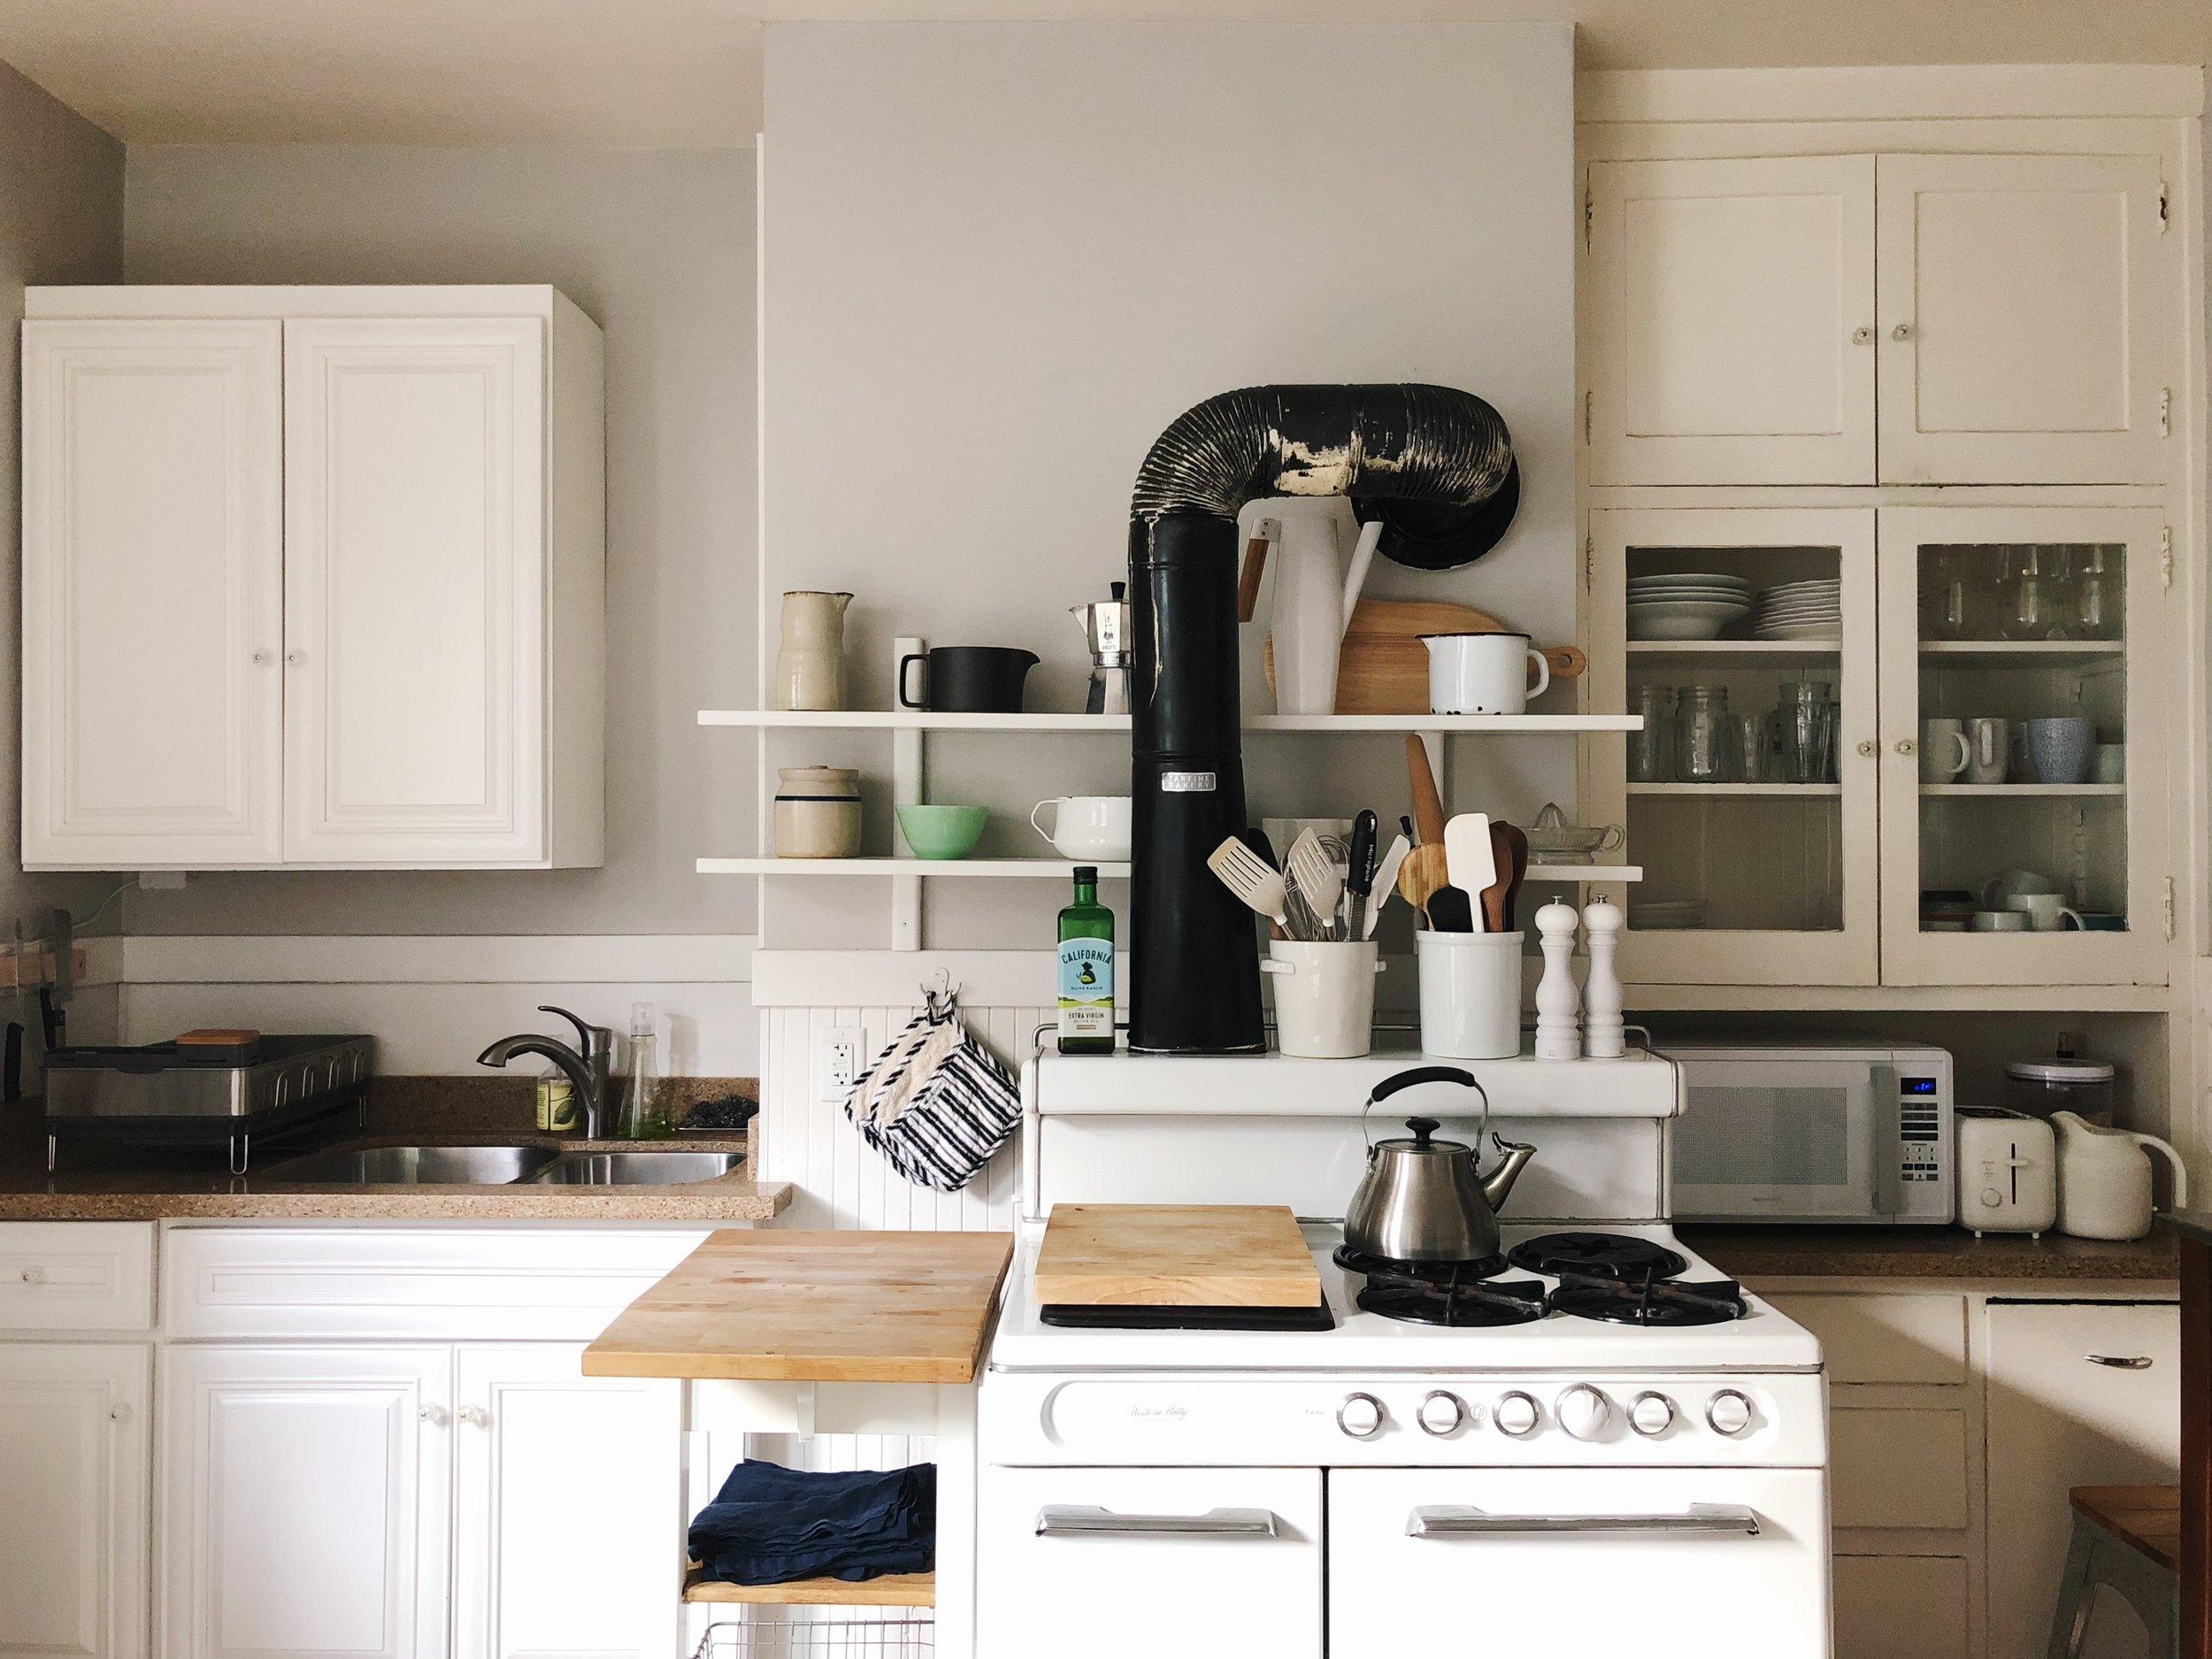 Kitchen cart:  Ikea . White wall shelves: Ikea. Pot holders:  Williams Sonoma . Navy napkins:  Crate and Barrel . Dish rack:  SimpleHuman .